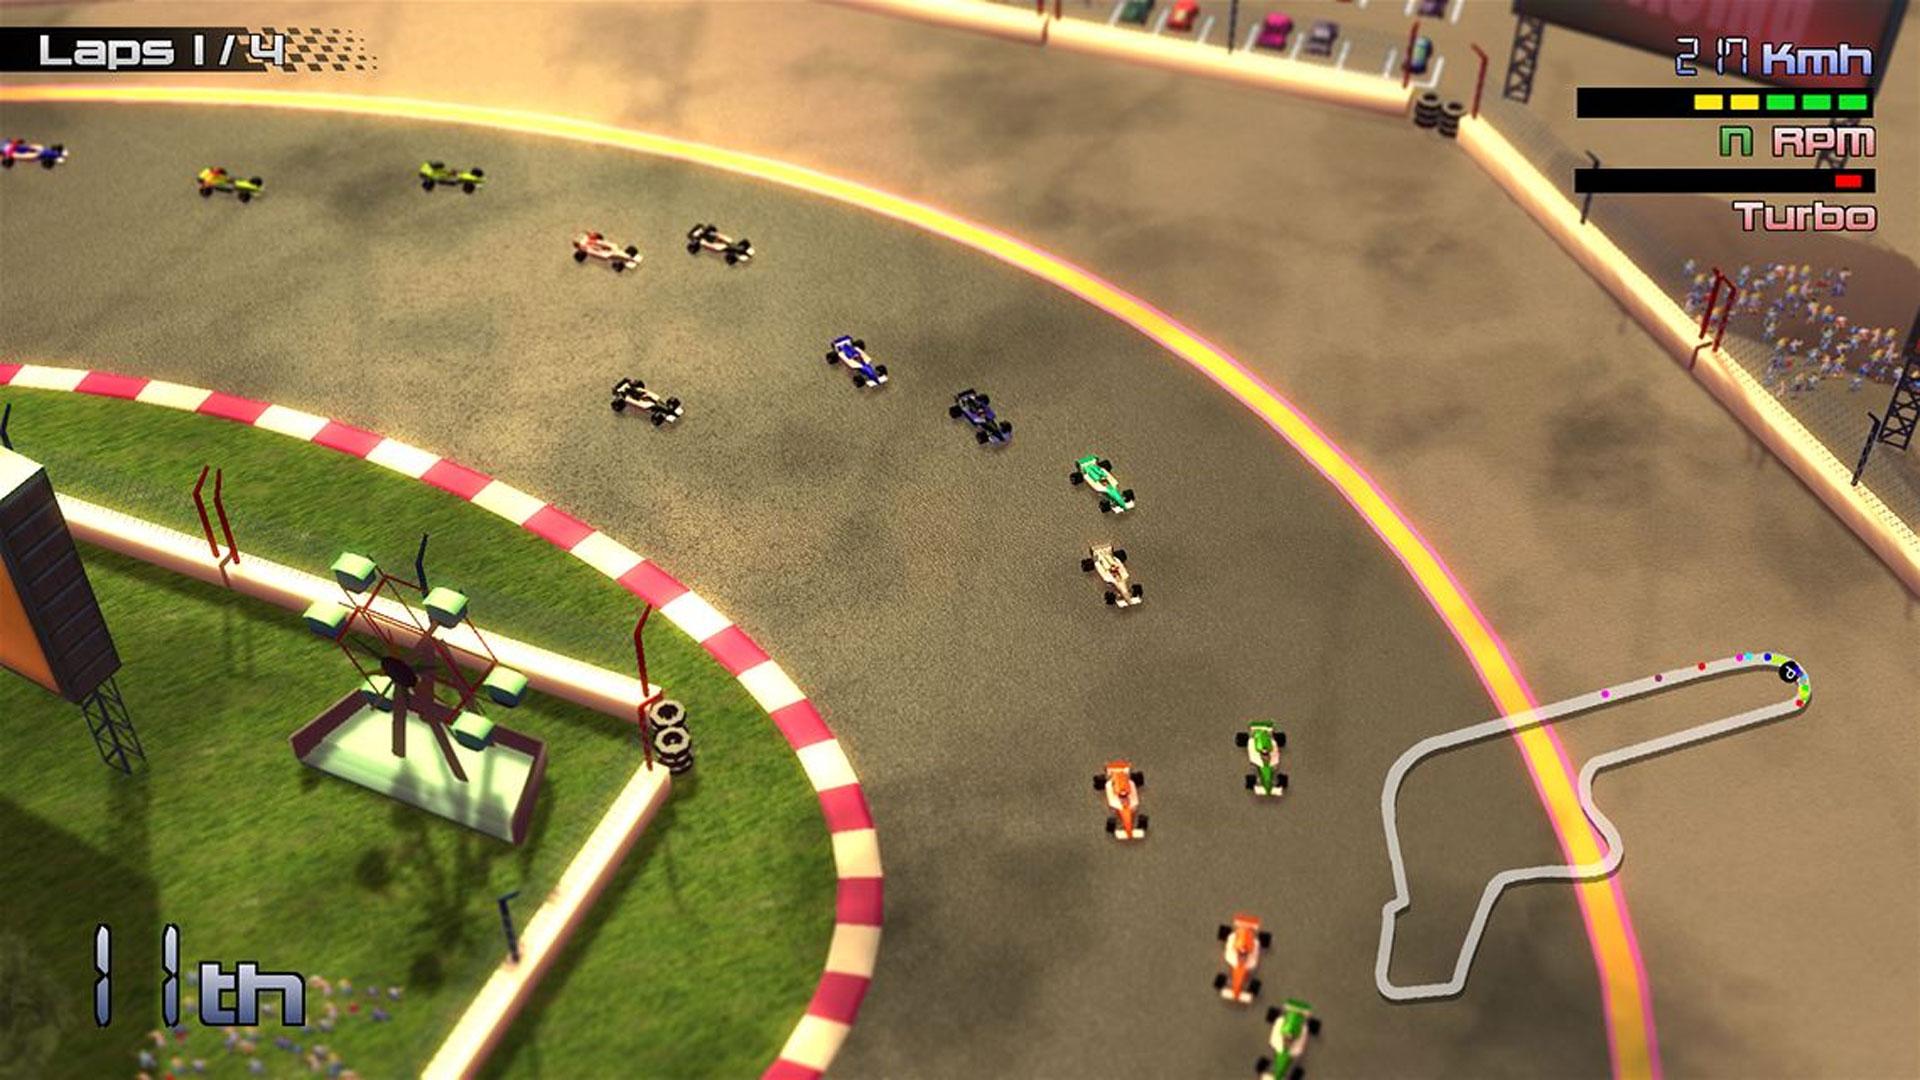 Grand Prix Rock 'N Racing Nintendo Switch Screenshot